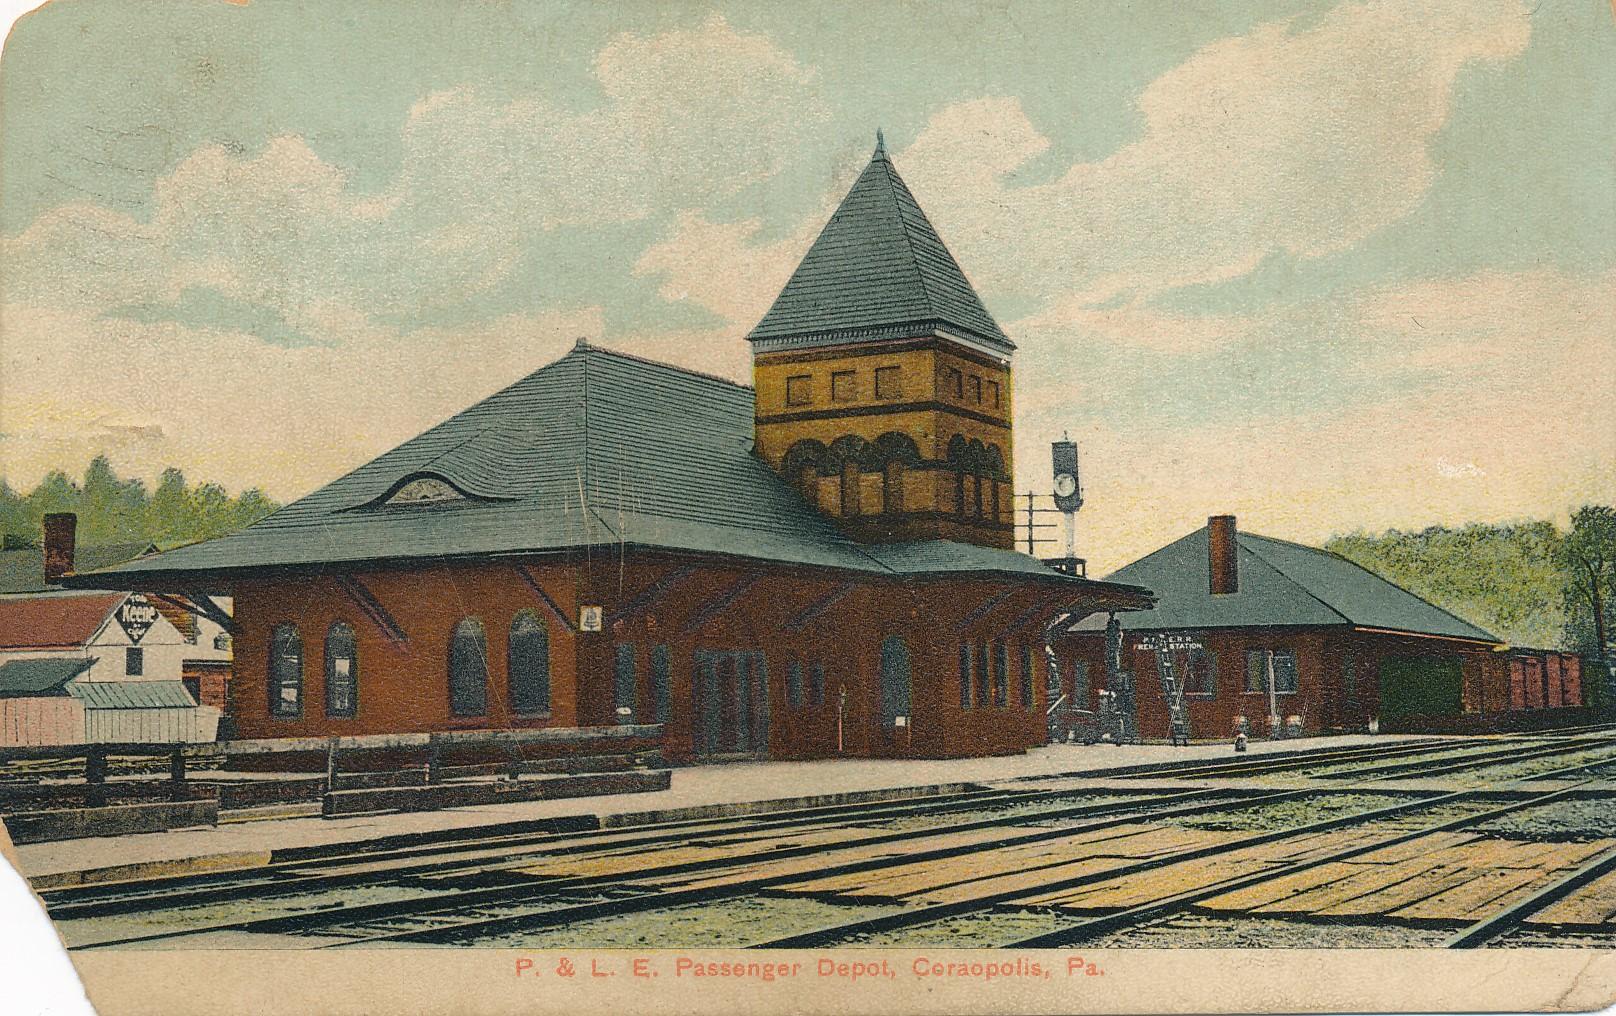 Coraopolis Train Station (14).jpg